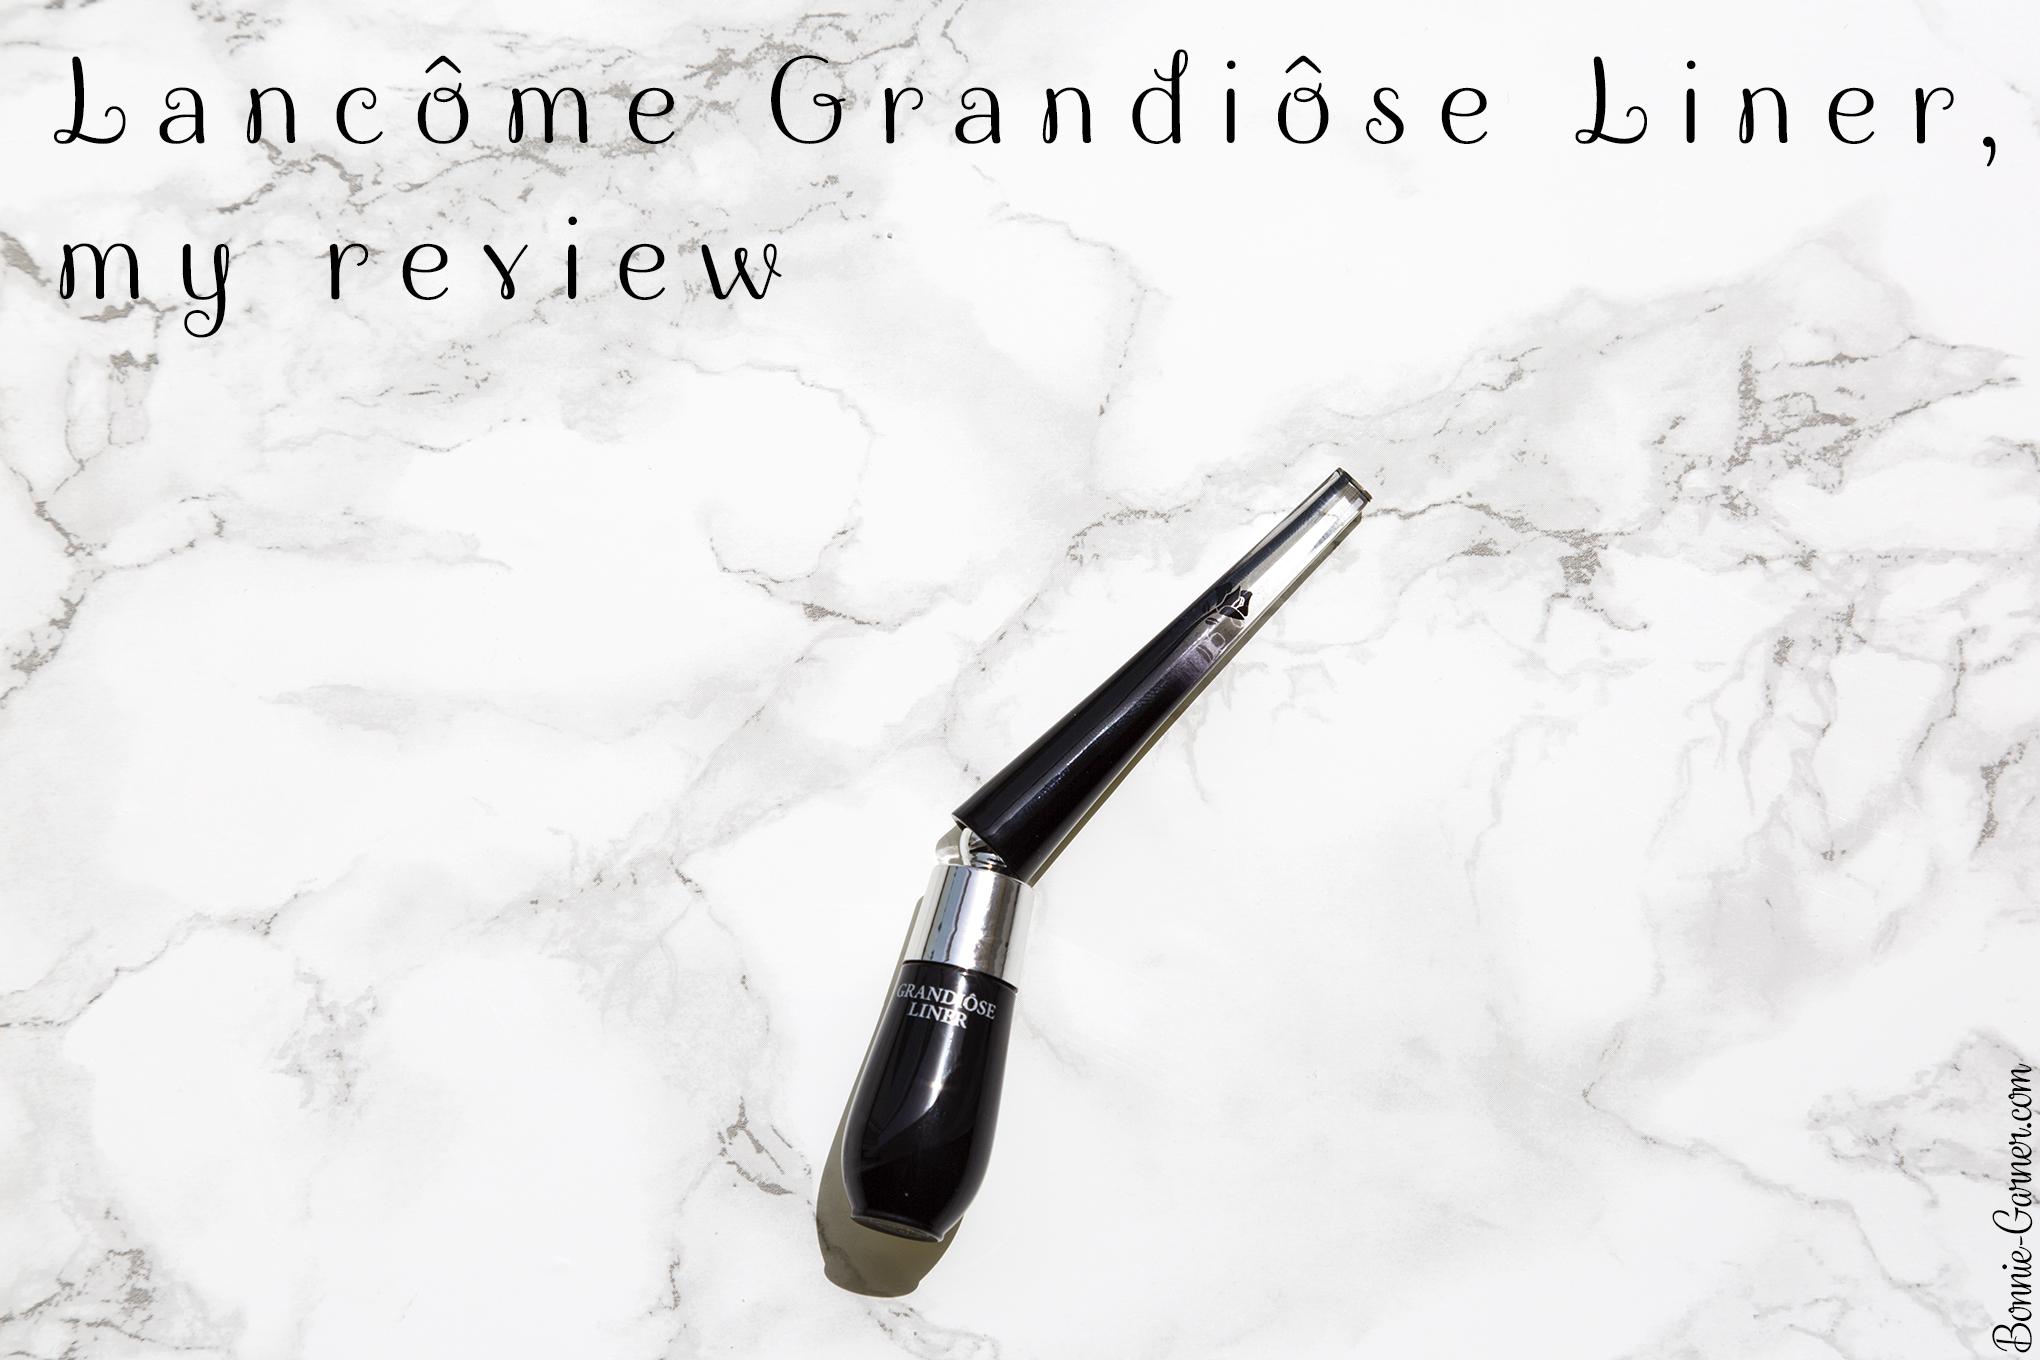 66ad4d7141d Lancôme Grandiôse Liner, my review | Bonnie Garner – Skincare ...